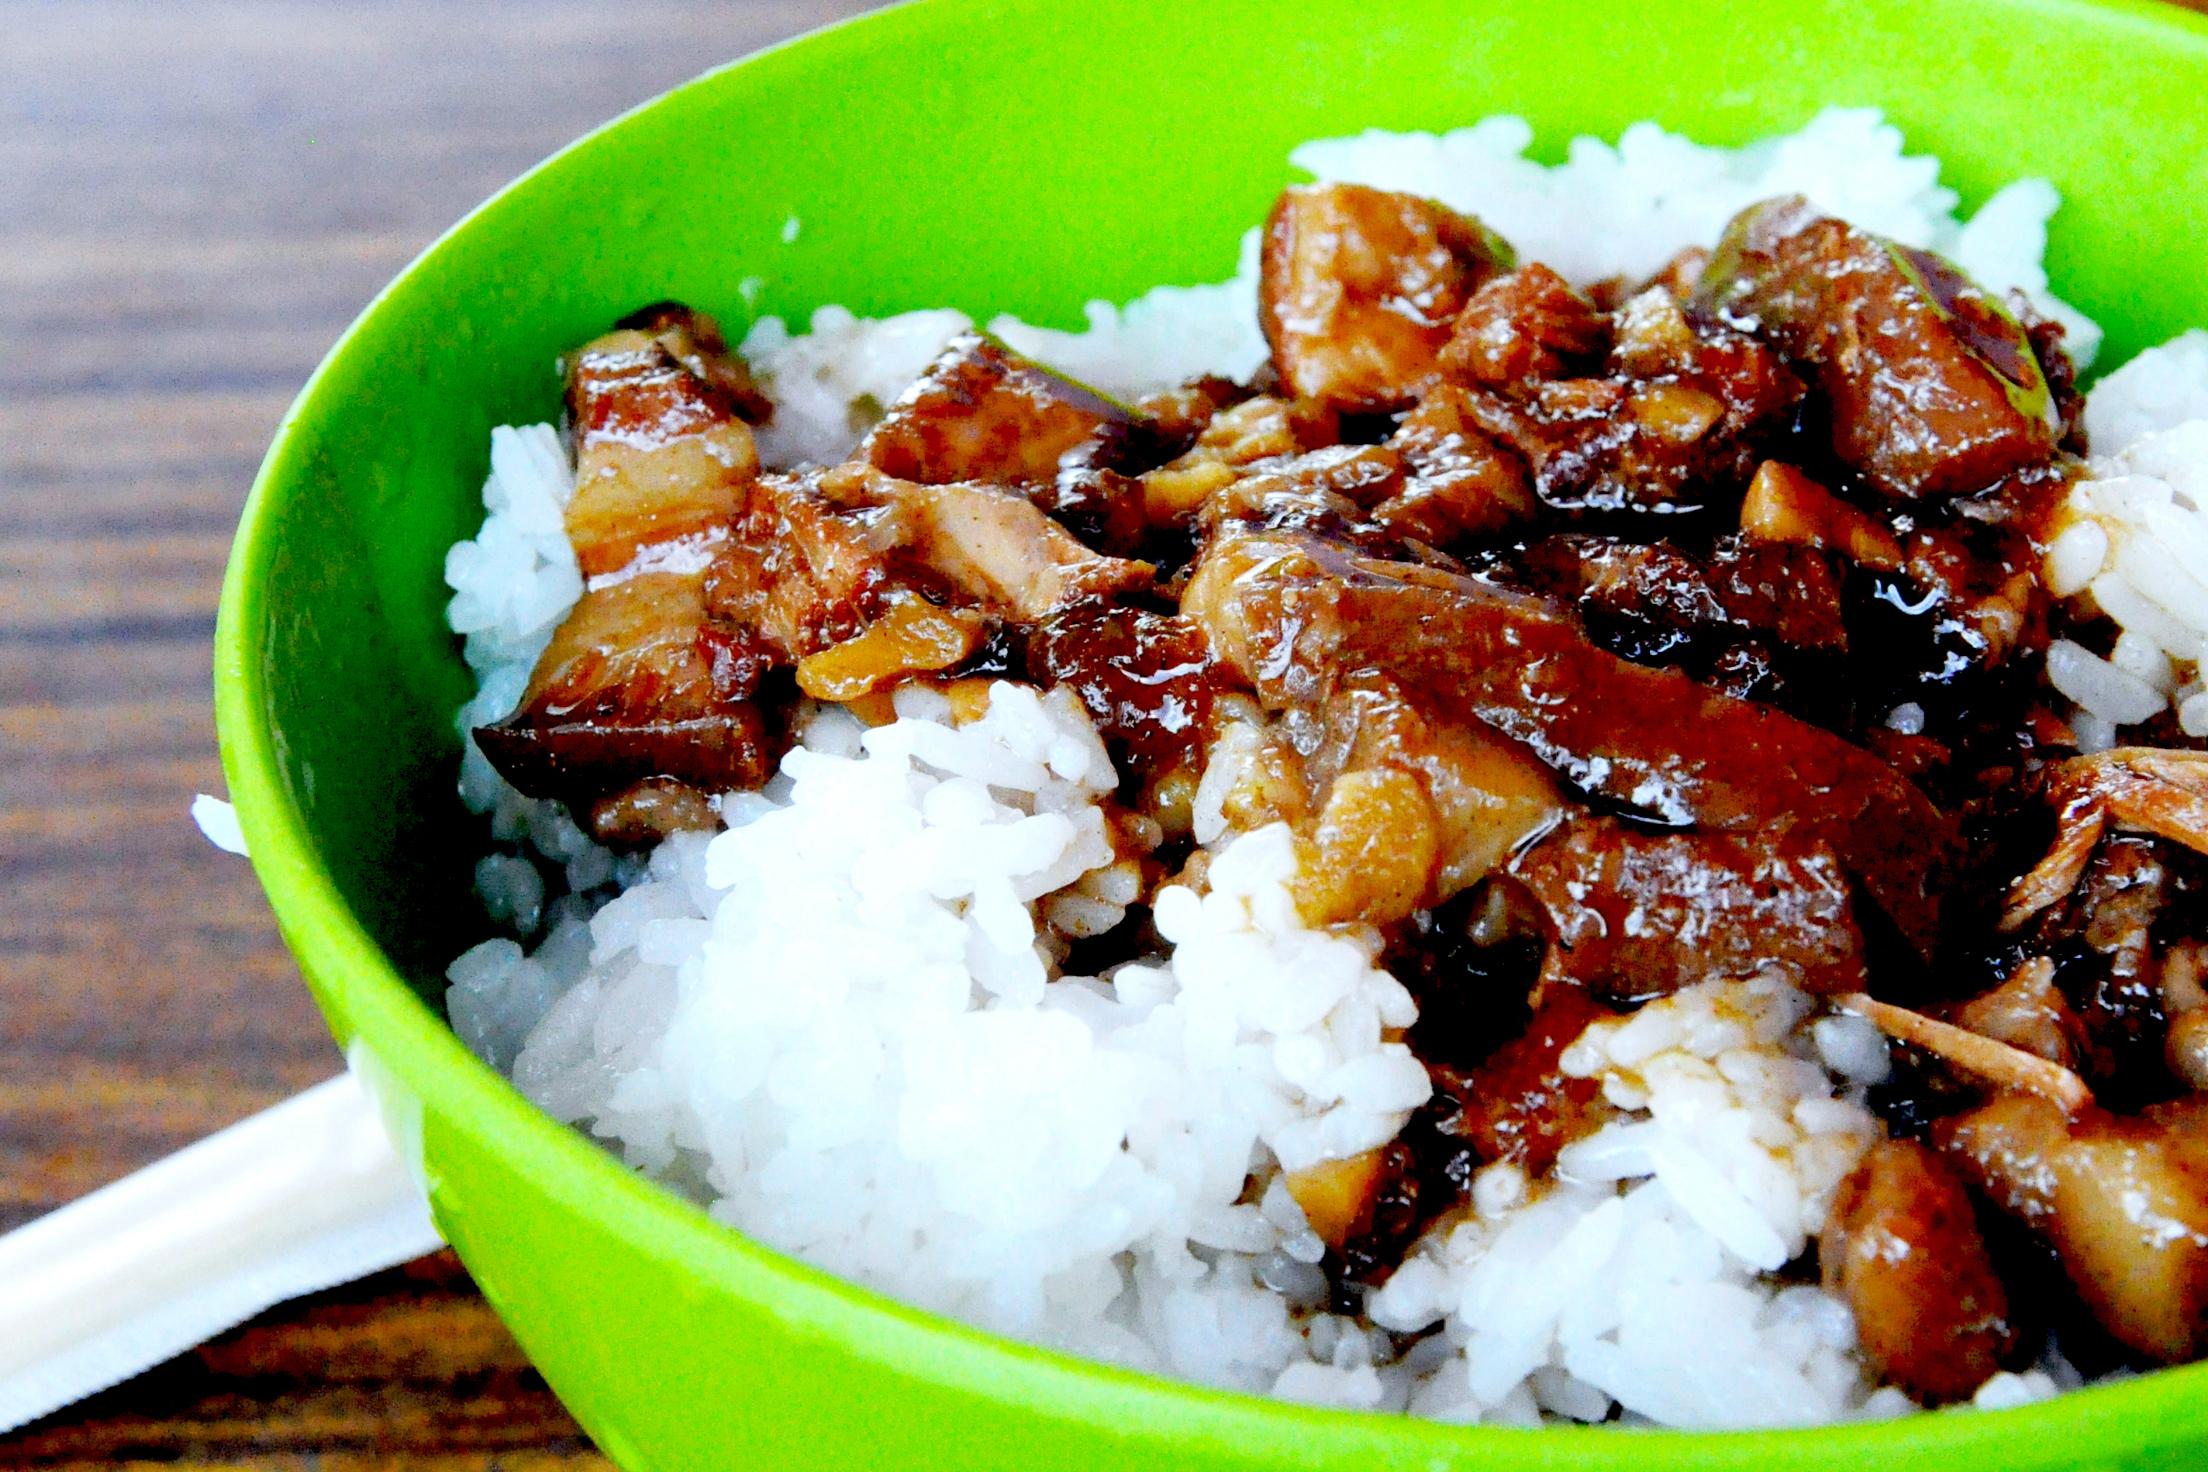 Lu rou fan  (braised pork on rice) at Shifen